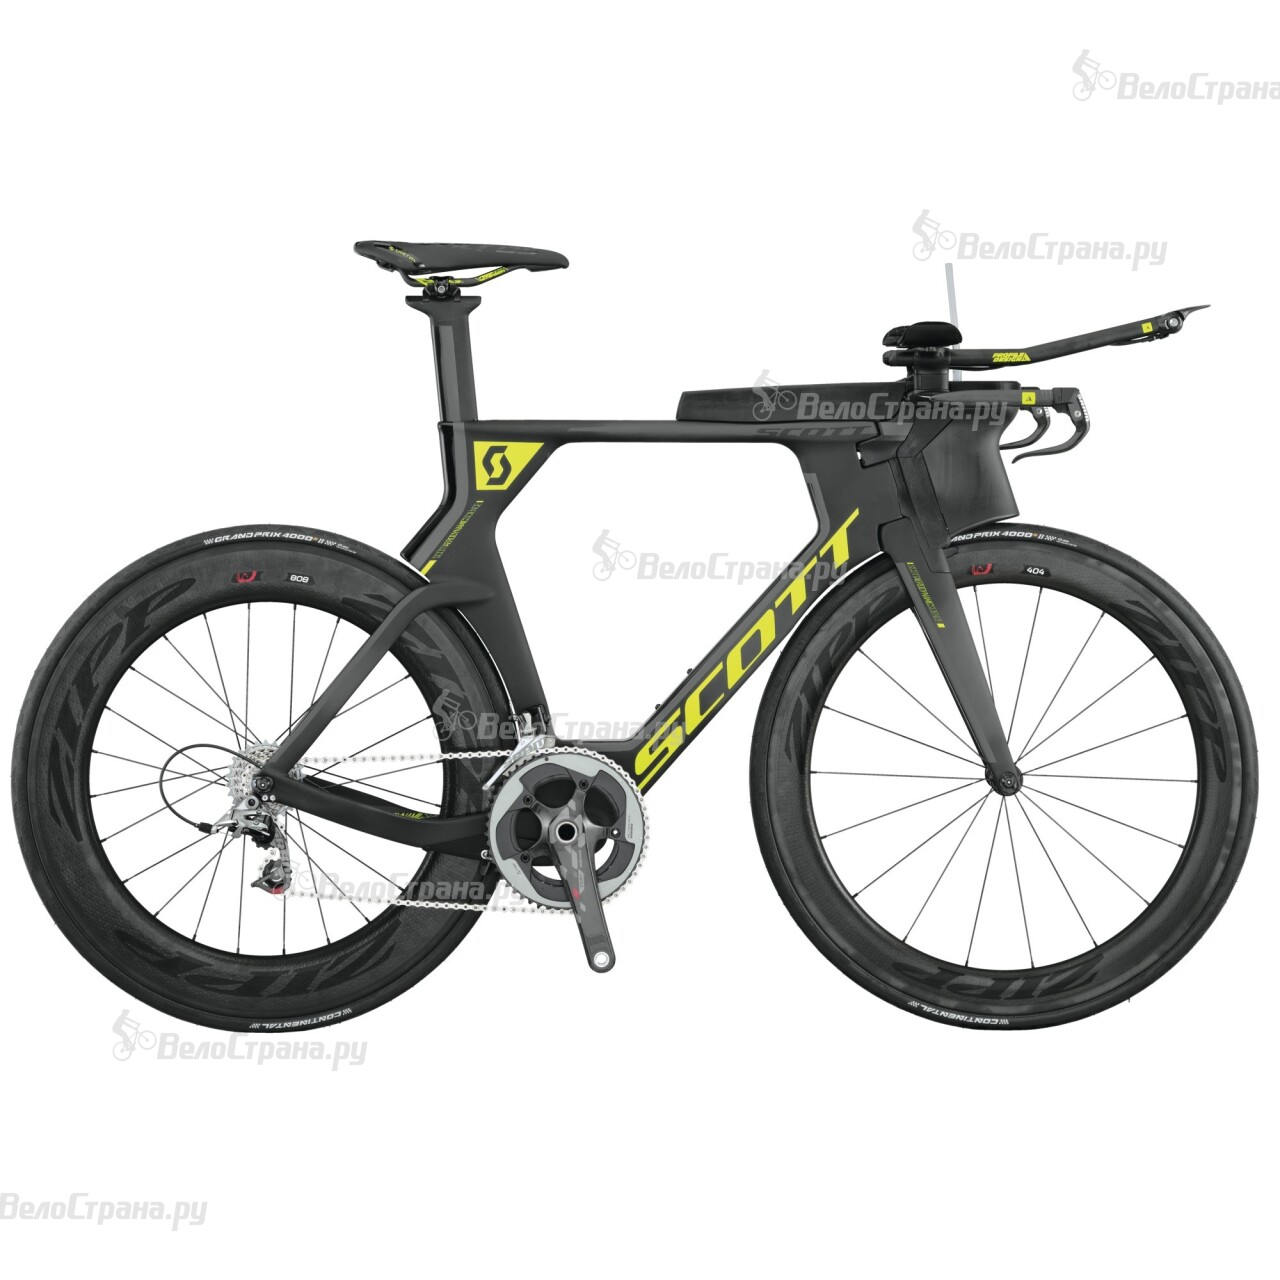 Велосипед Scott Plasma Team Issue (2015)  цена и фото